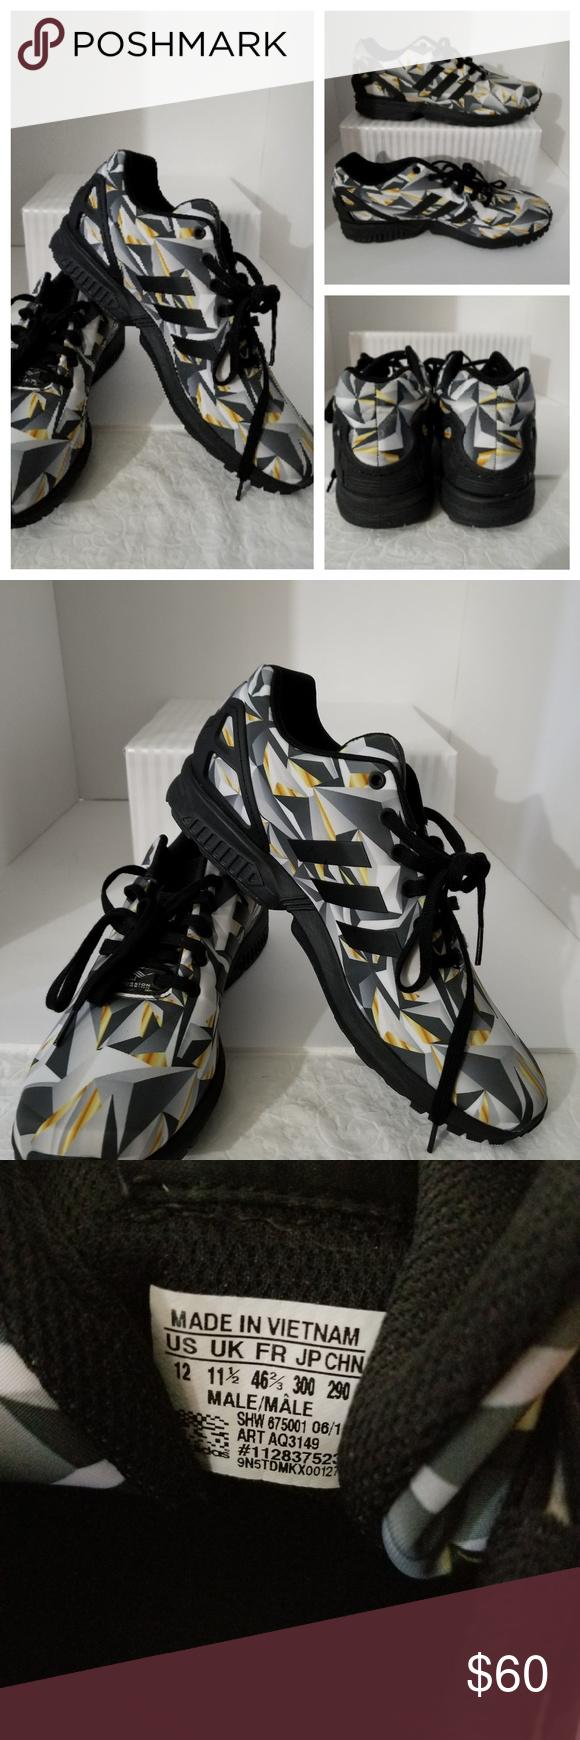 Adidas Torsion SHW 675001 Men's